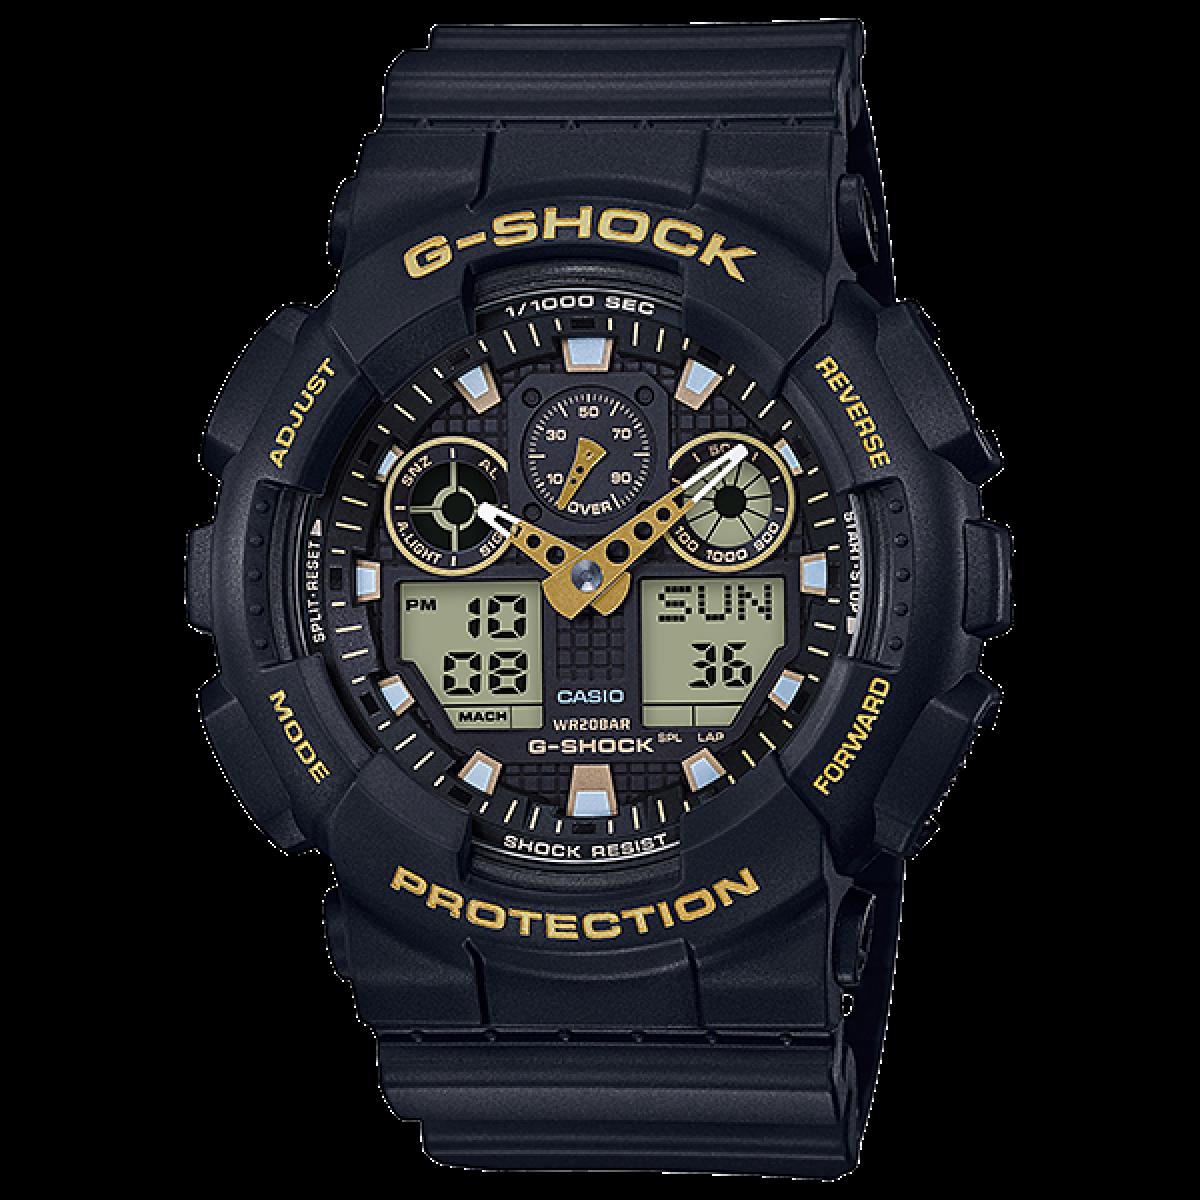 https://www.gaberjoyeria.com/4088-thickbox_default/reloj-casio-gshock.jpg